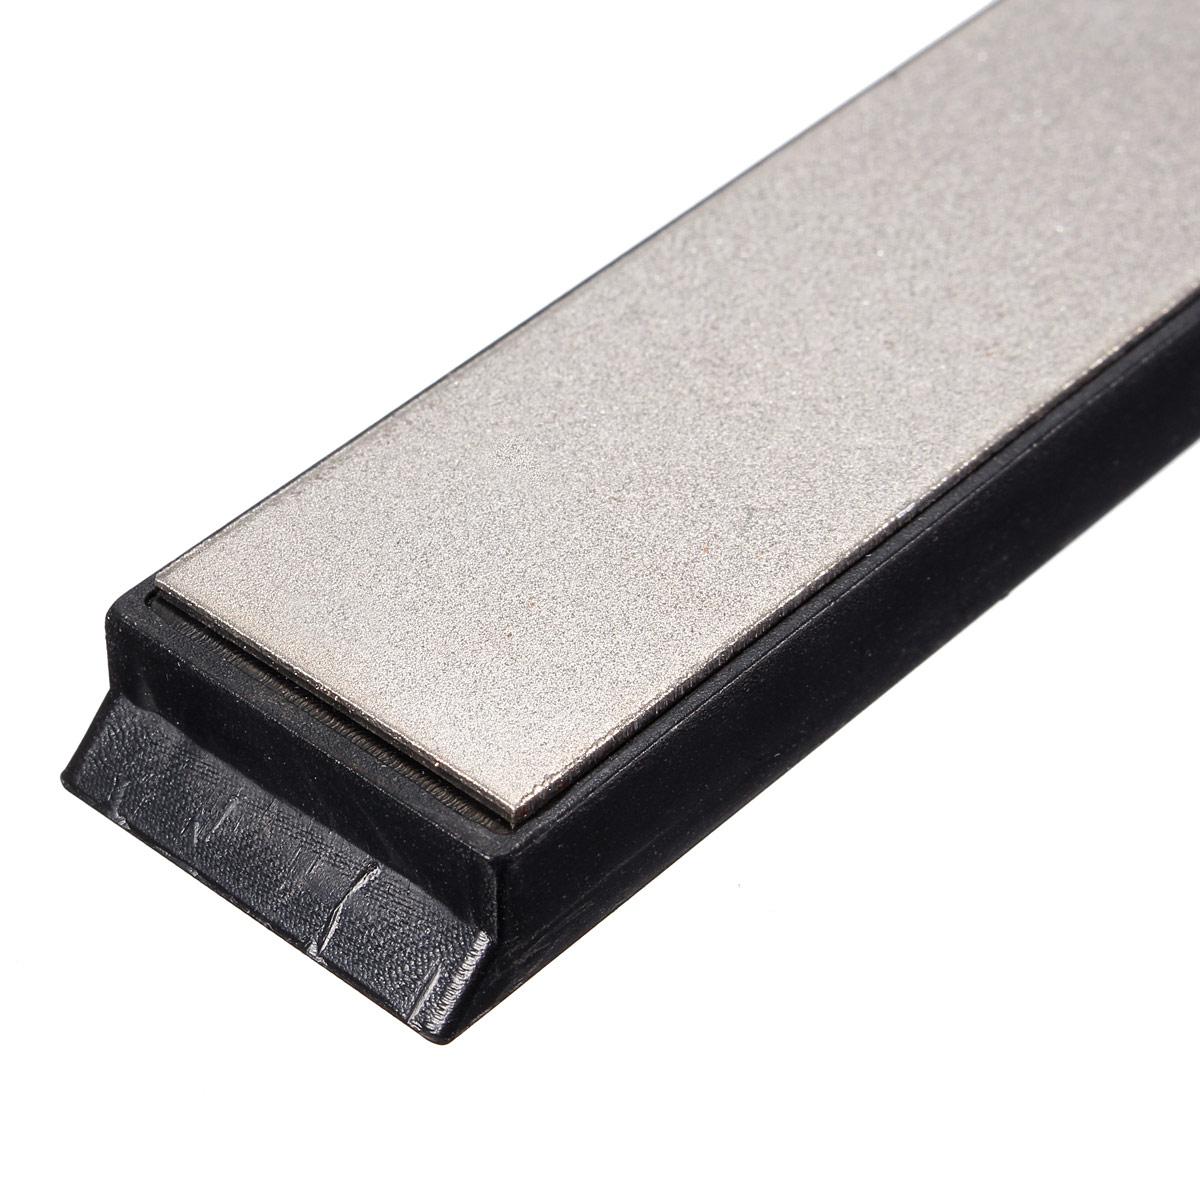 Pro 500 Diamond Sharpening Stone Whetstone Apex Edge Kitchen Knife Sharpener Ebay